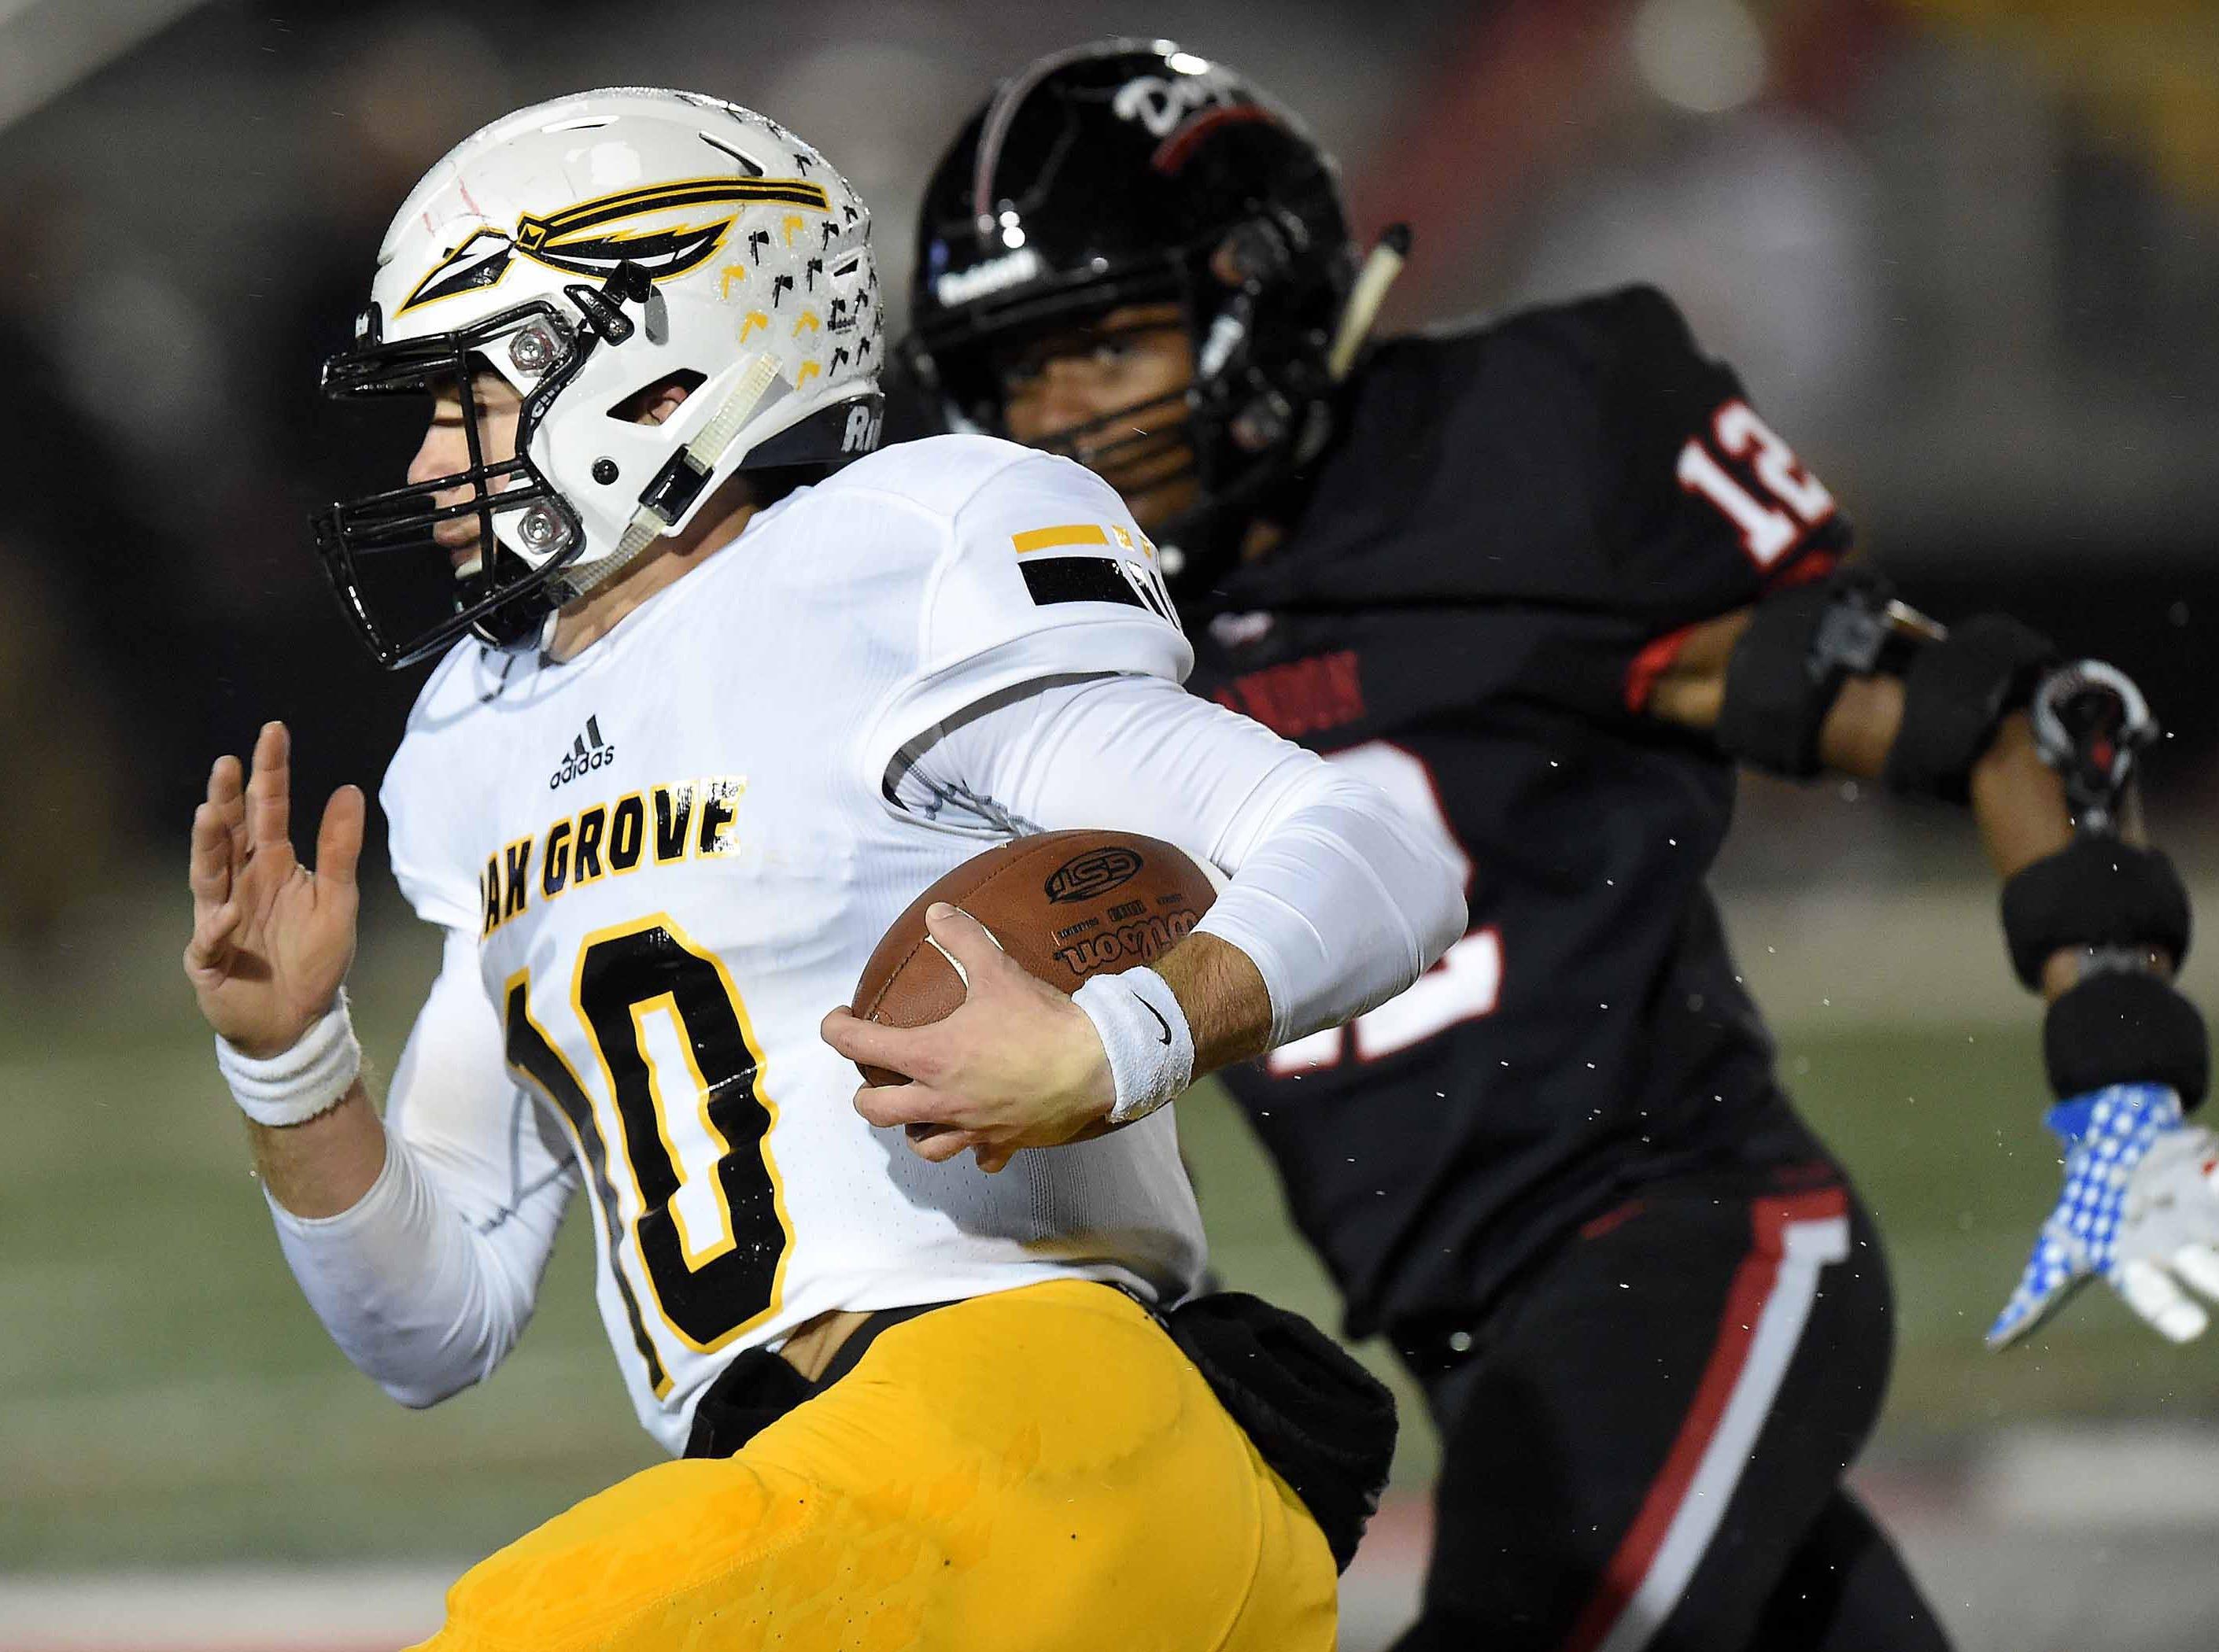 Oak Grove quarterback John Rhys Plumlee (10) runs against Brandon in the MHSAA Class 6A South State Championship on Friday, November 23, 2018, at Brandon High School in Brandon, Miss.